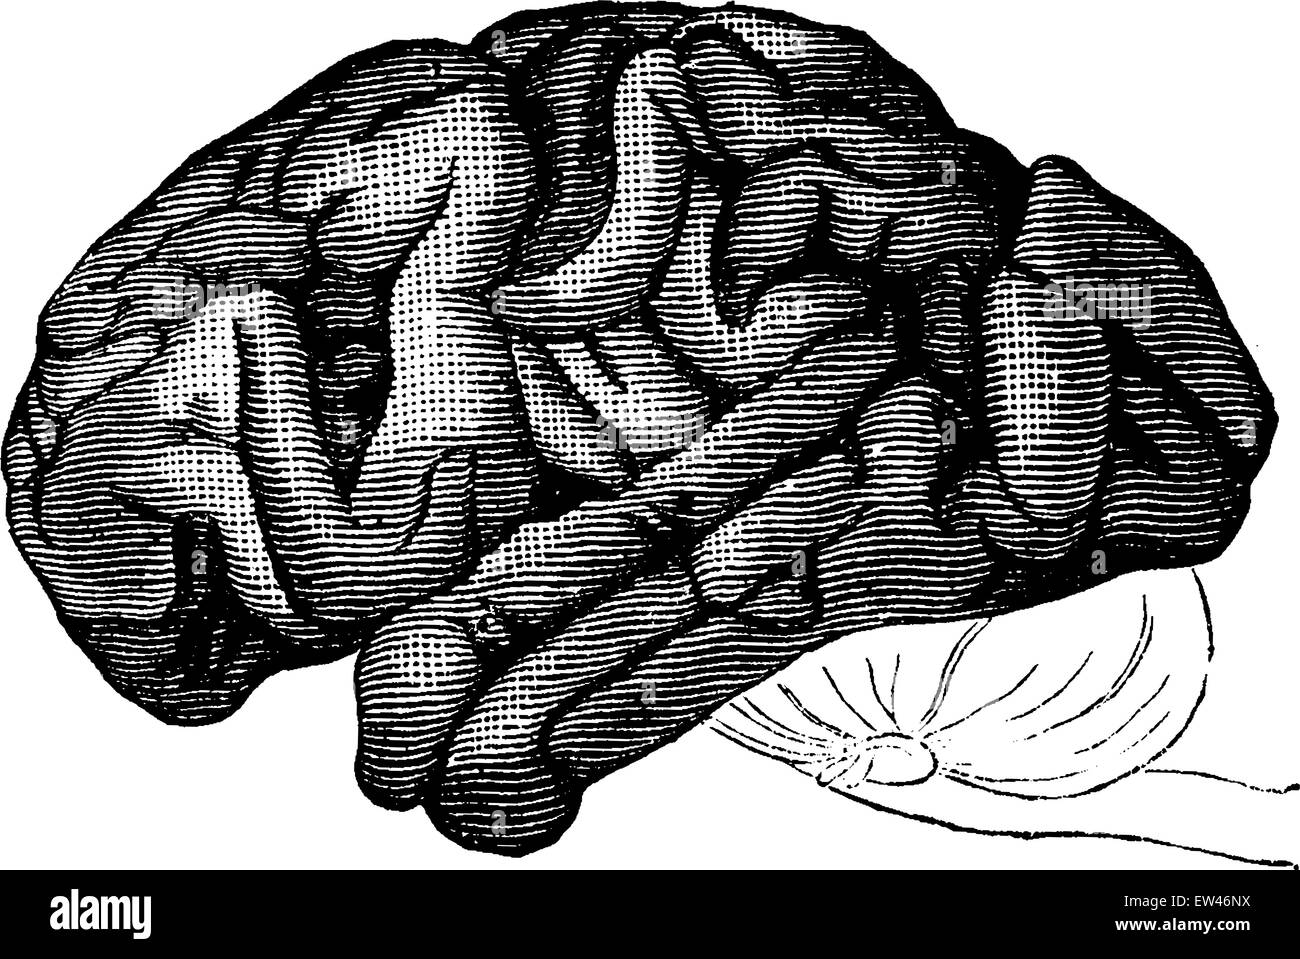 chimpanzee skull diagram 2001 dodge ram 3500 wiring brain drawing old stock photos and